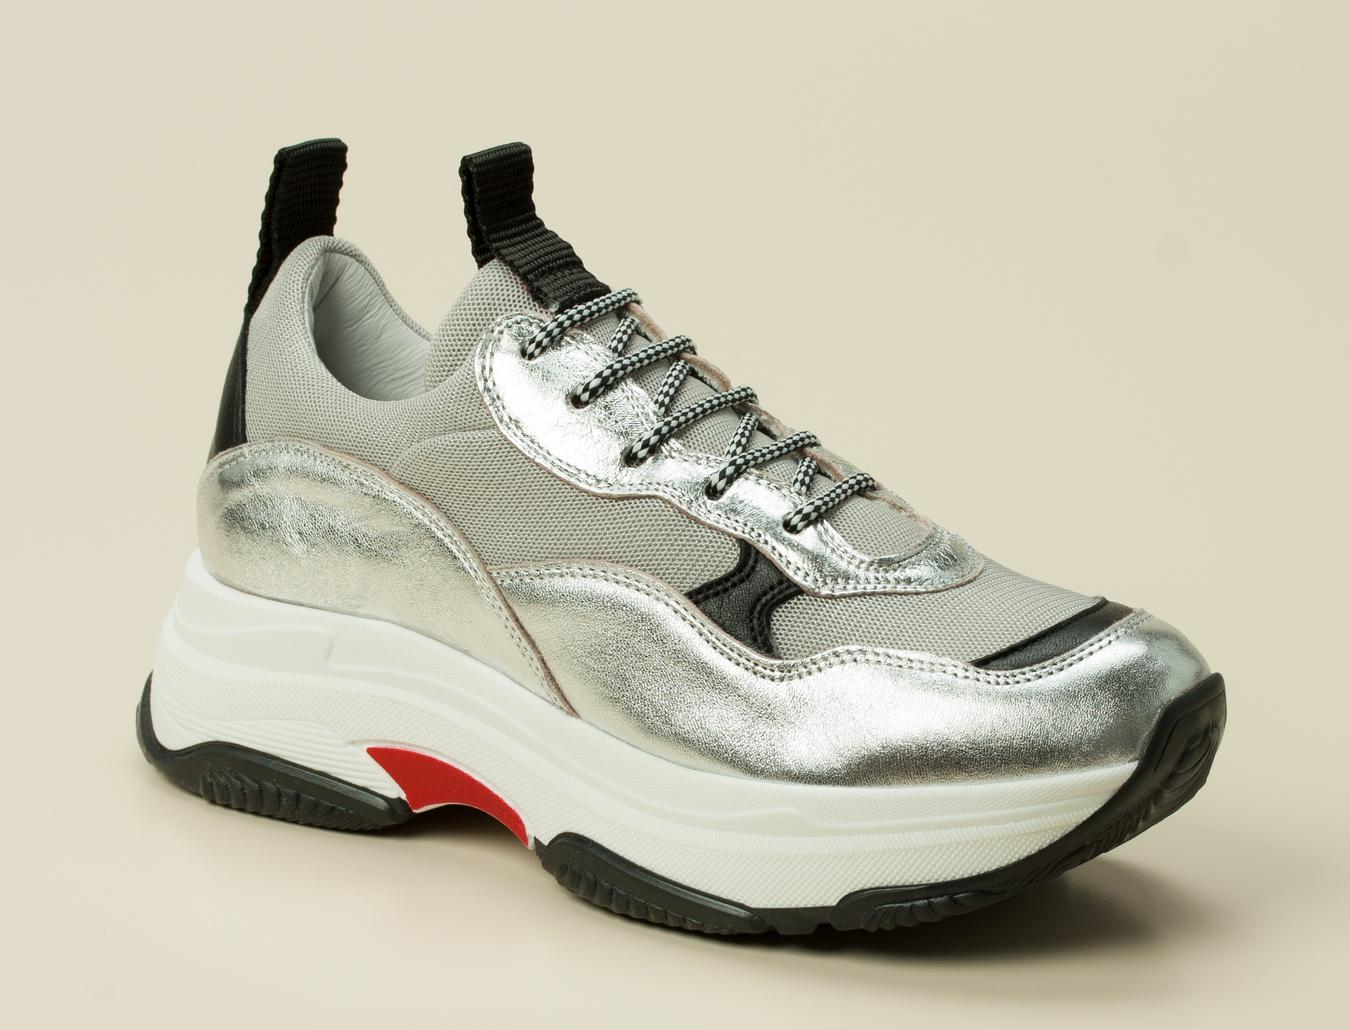 d56a86882bdb Gio+ Damen Sneaker in silber kaufen | Zumnorde Online-Shop